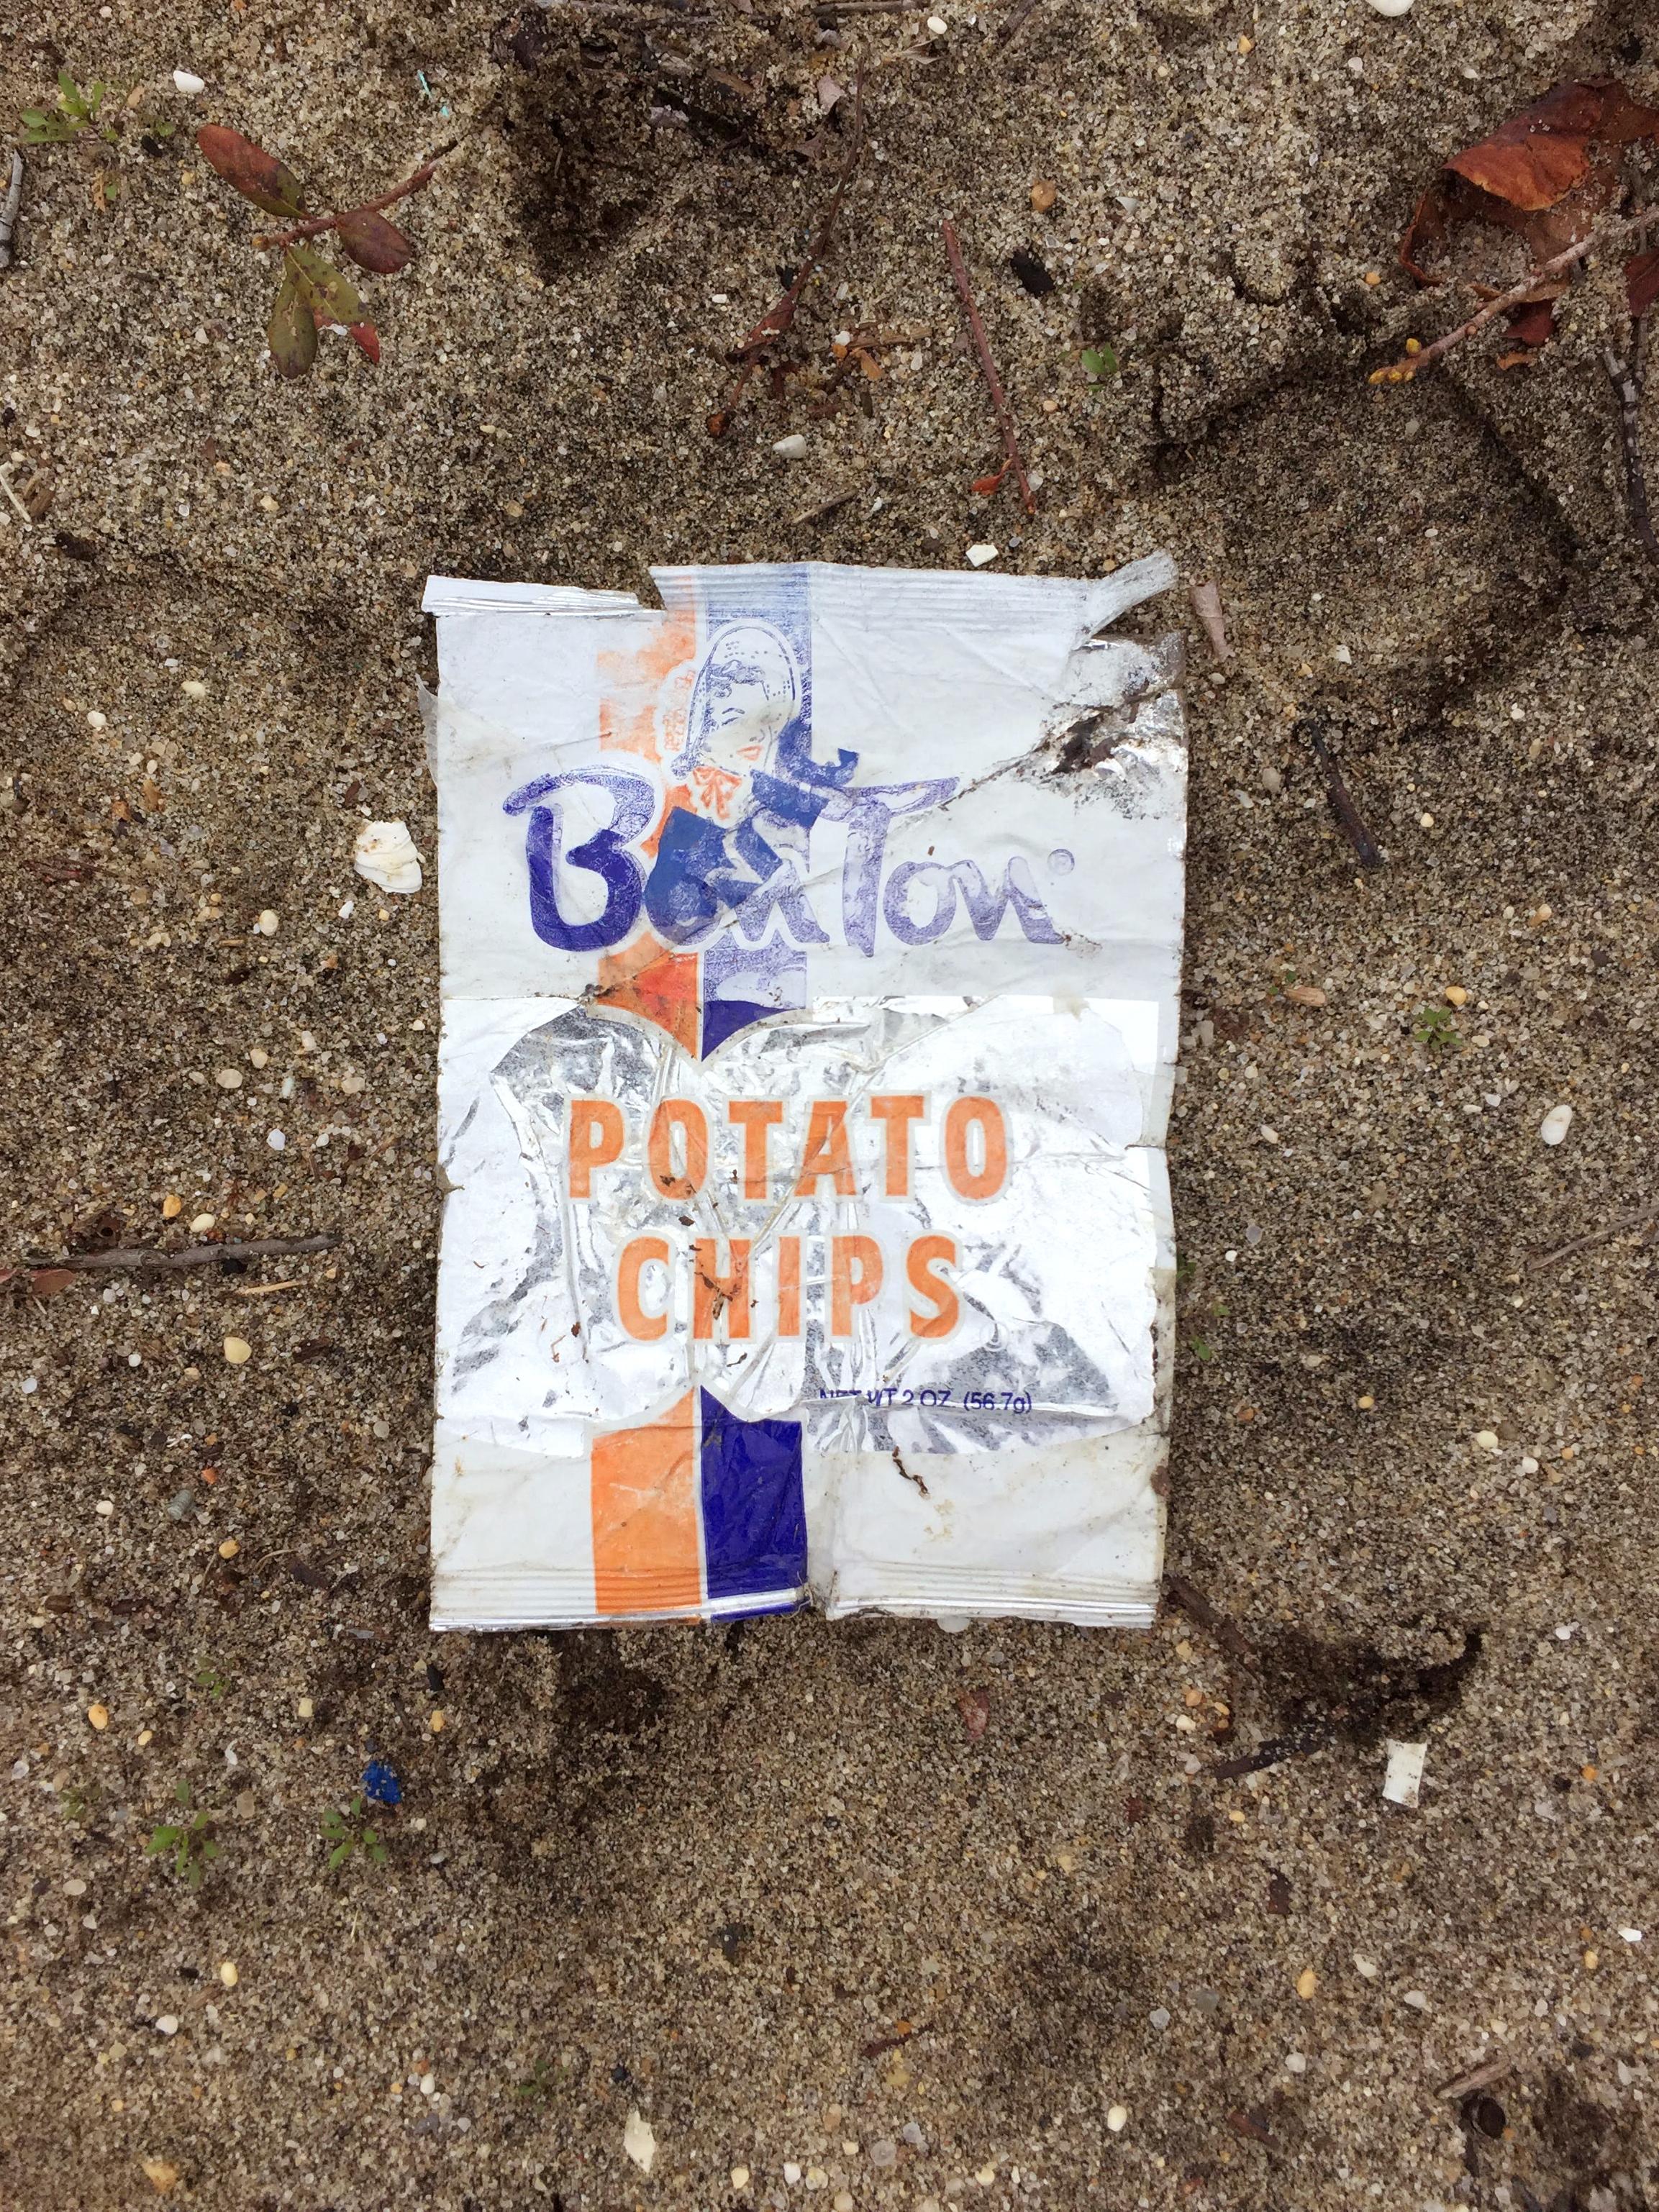 amy_chen_design_sandy_hook_beach_clean_chip_bag.JPG